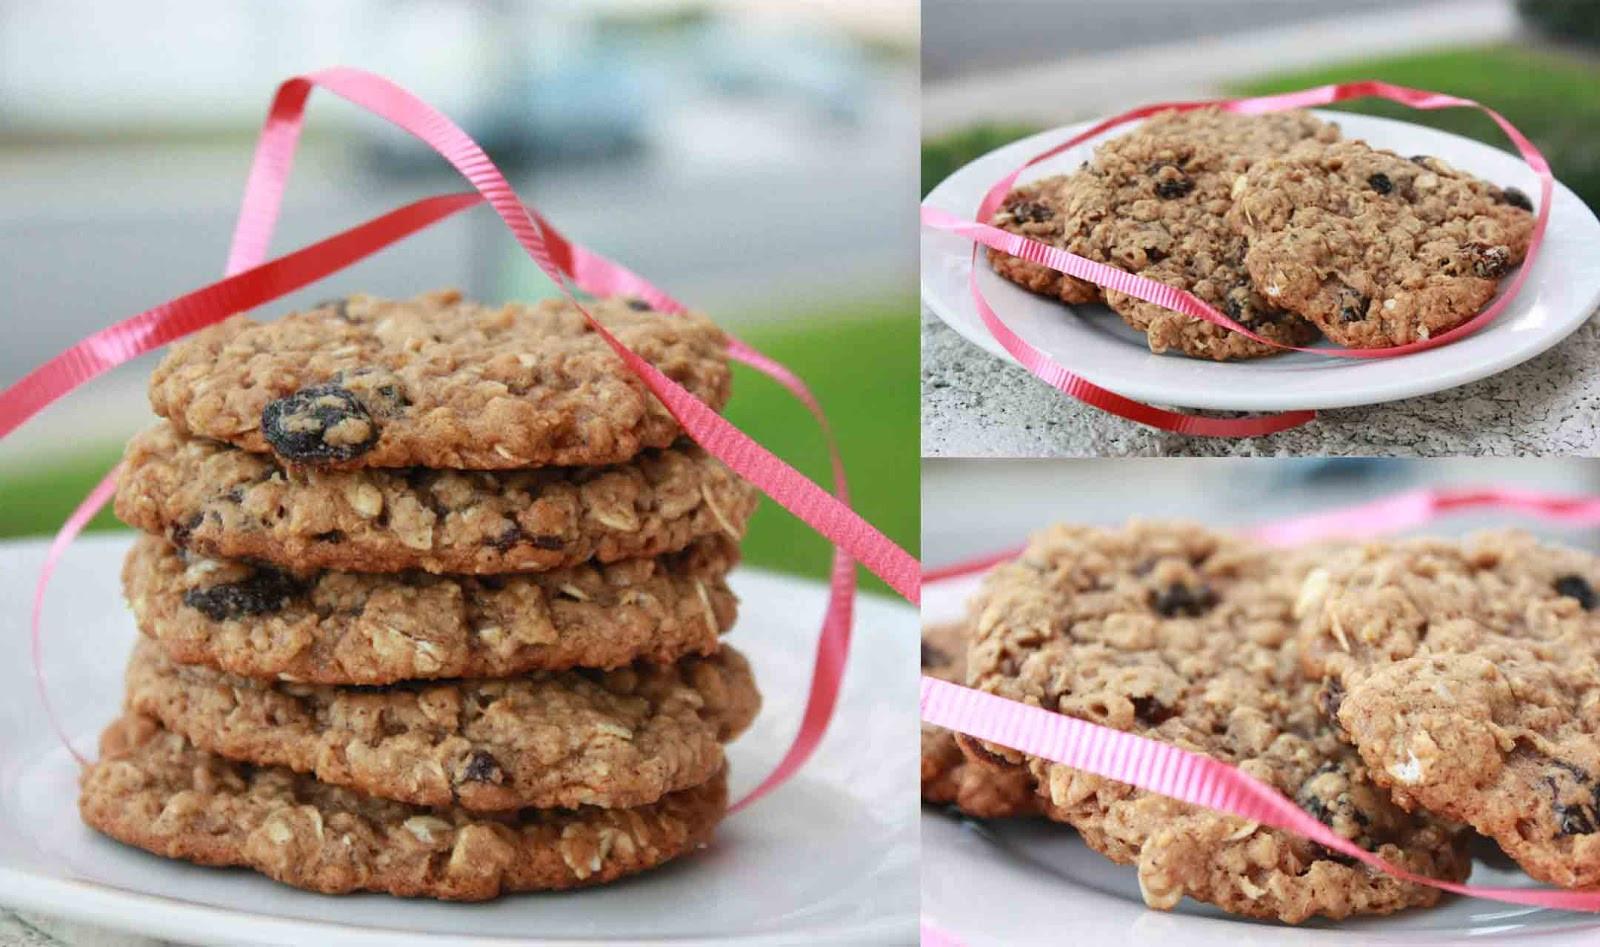 Low Fat Oatmeal Raisin Cookies  Low Fat Oatmeal Raisin Cookie Mega Dildo Insertion